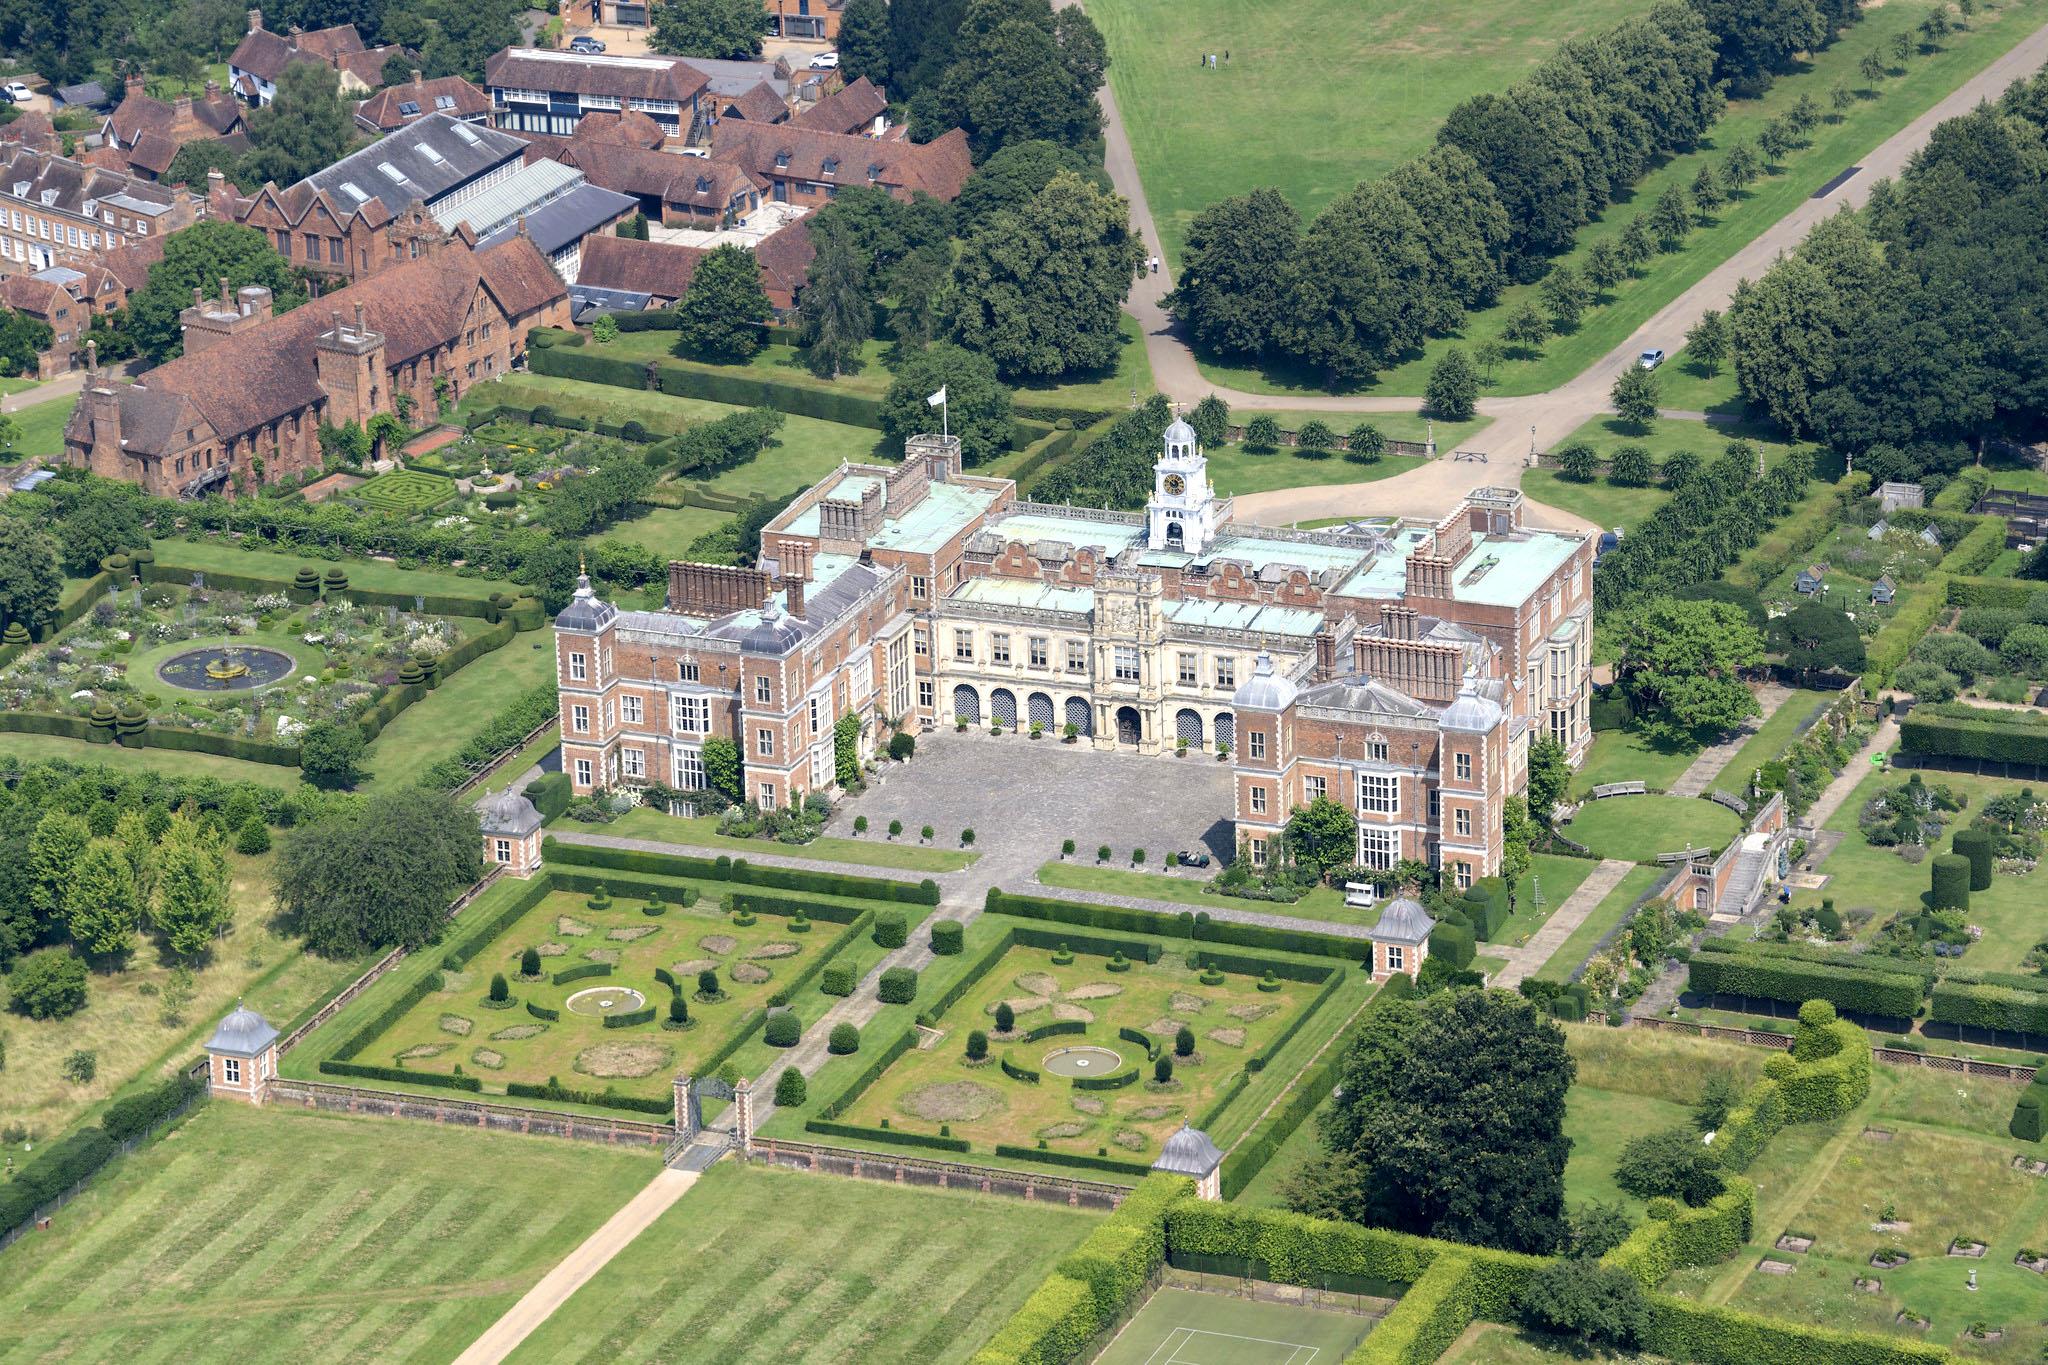 Hatfield House aerial image, Hertfordshire by John Fielding.jpg